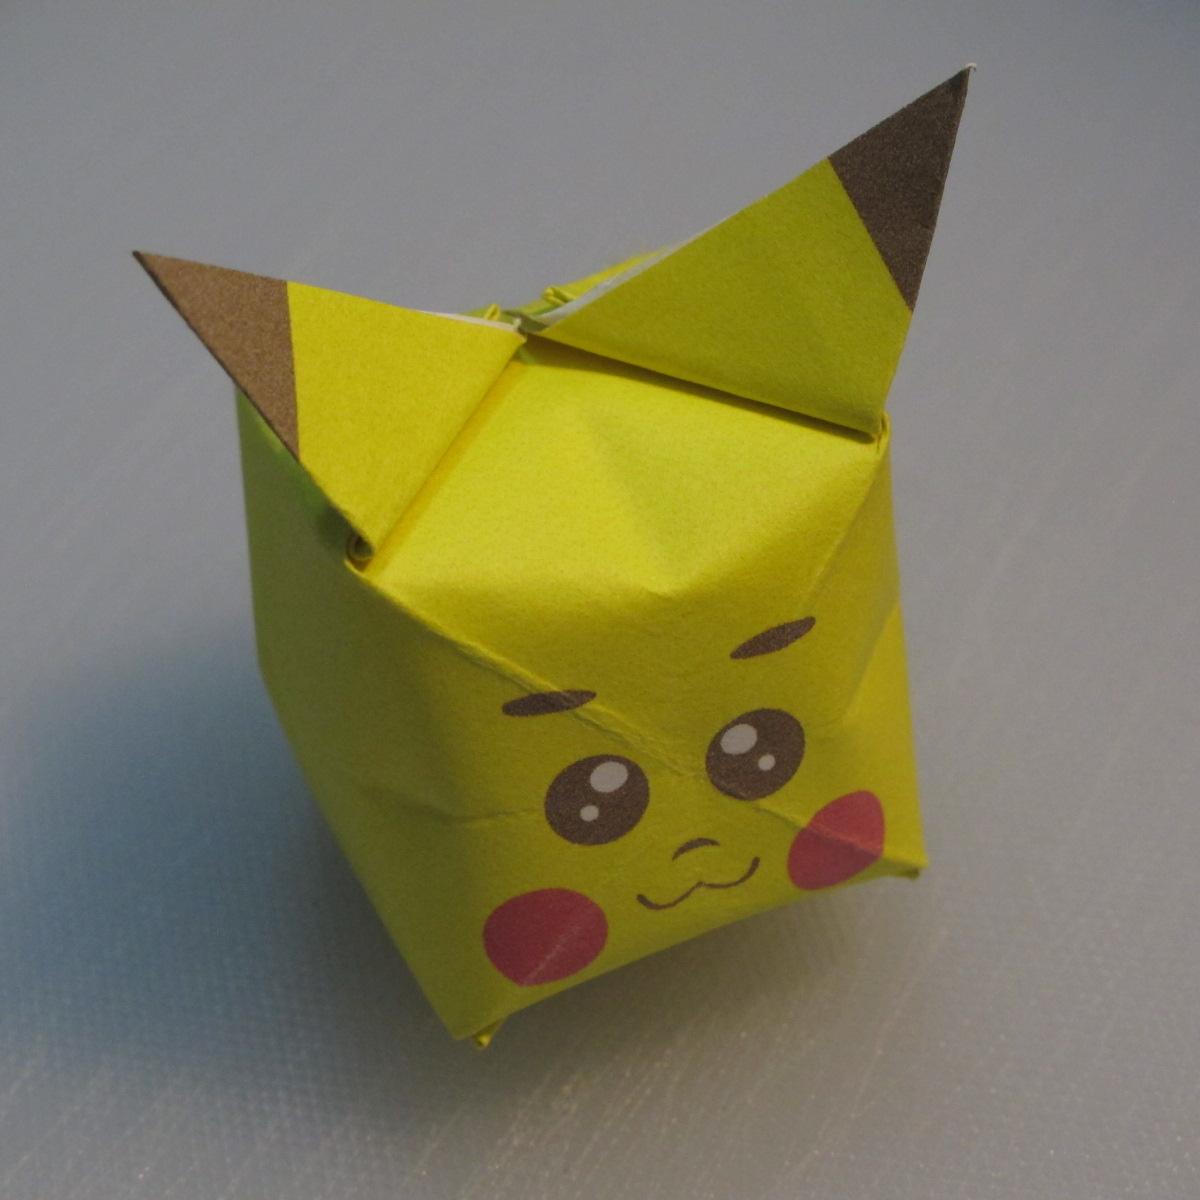 mookeep-วิธีพับกระดาษเป็นรูปปิกาจู-01-019